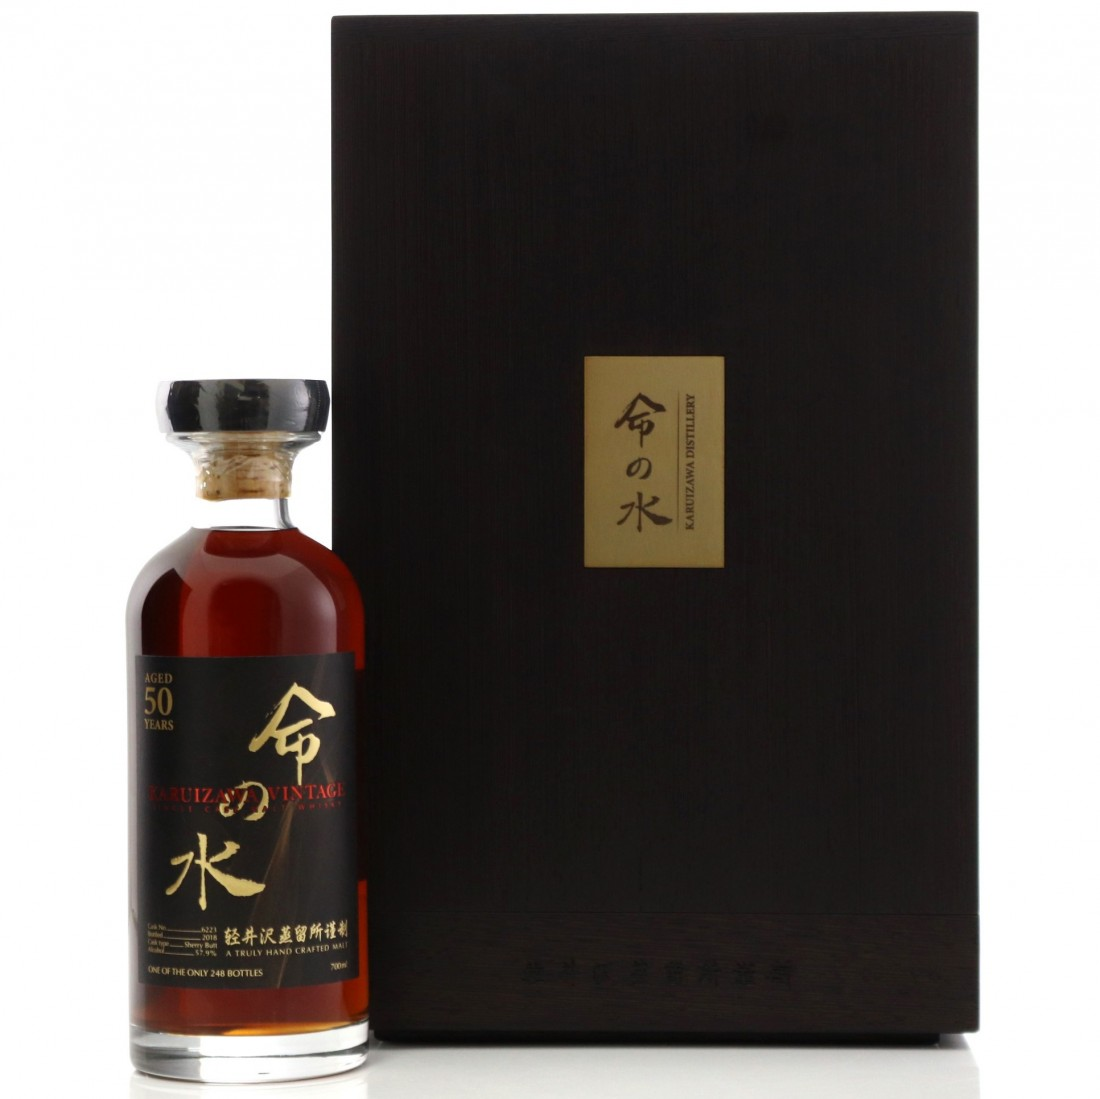 Karuizawa 50 Year Old Single Cask #6223 / Aqua of Life